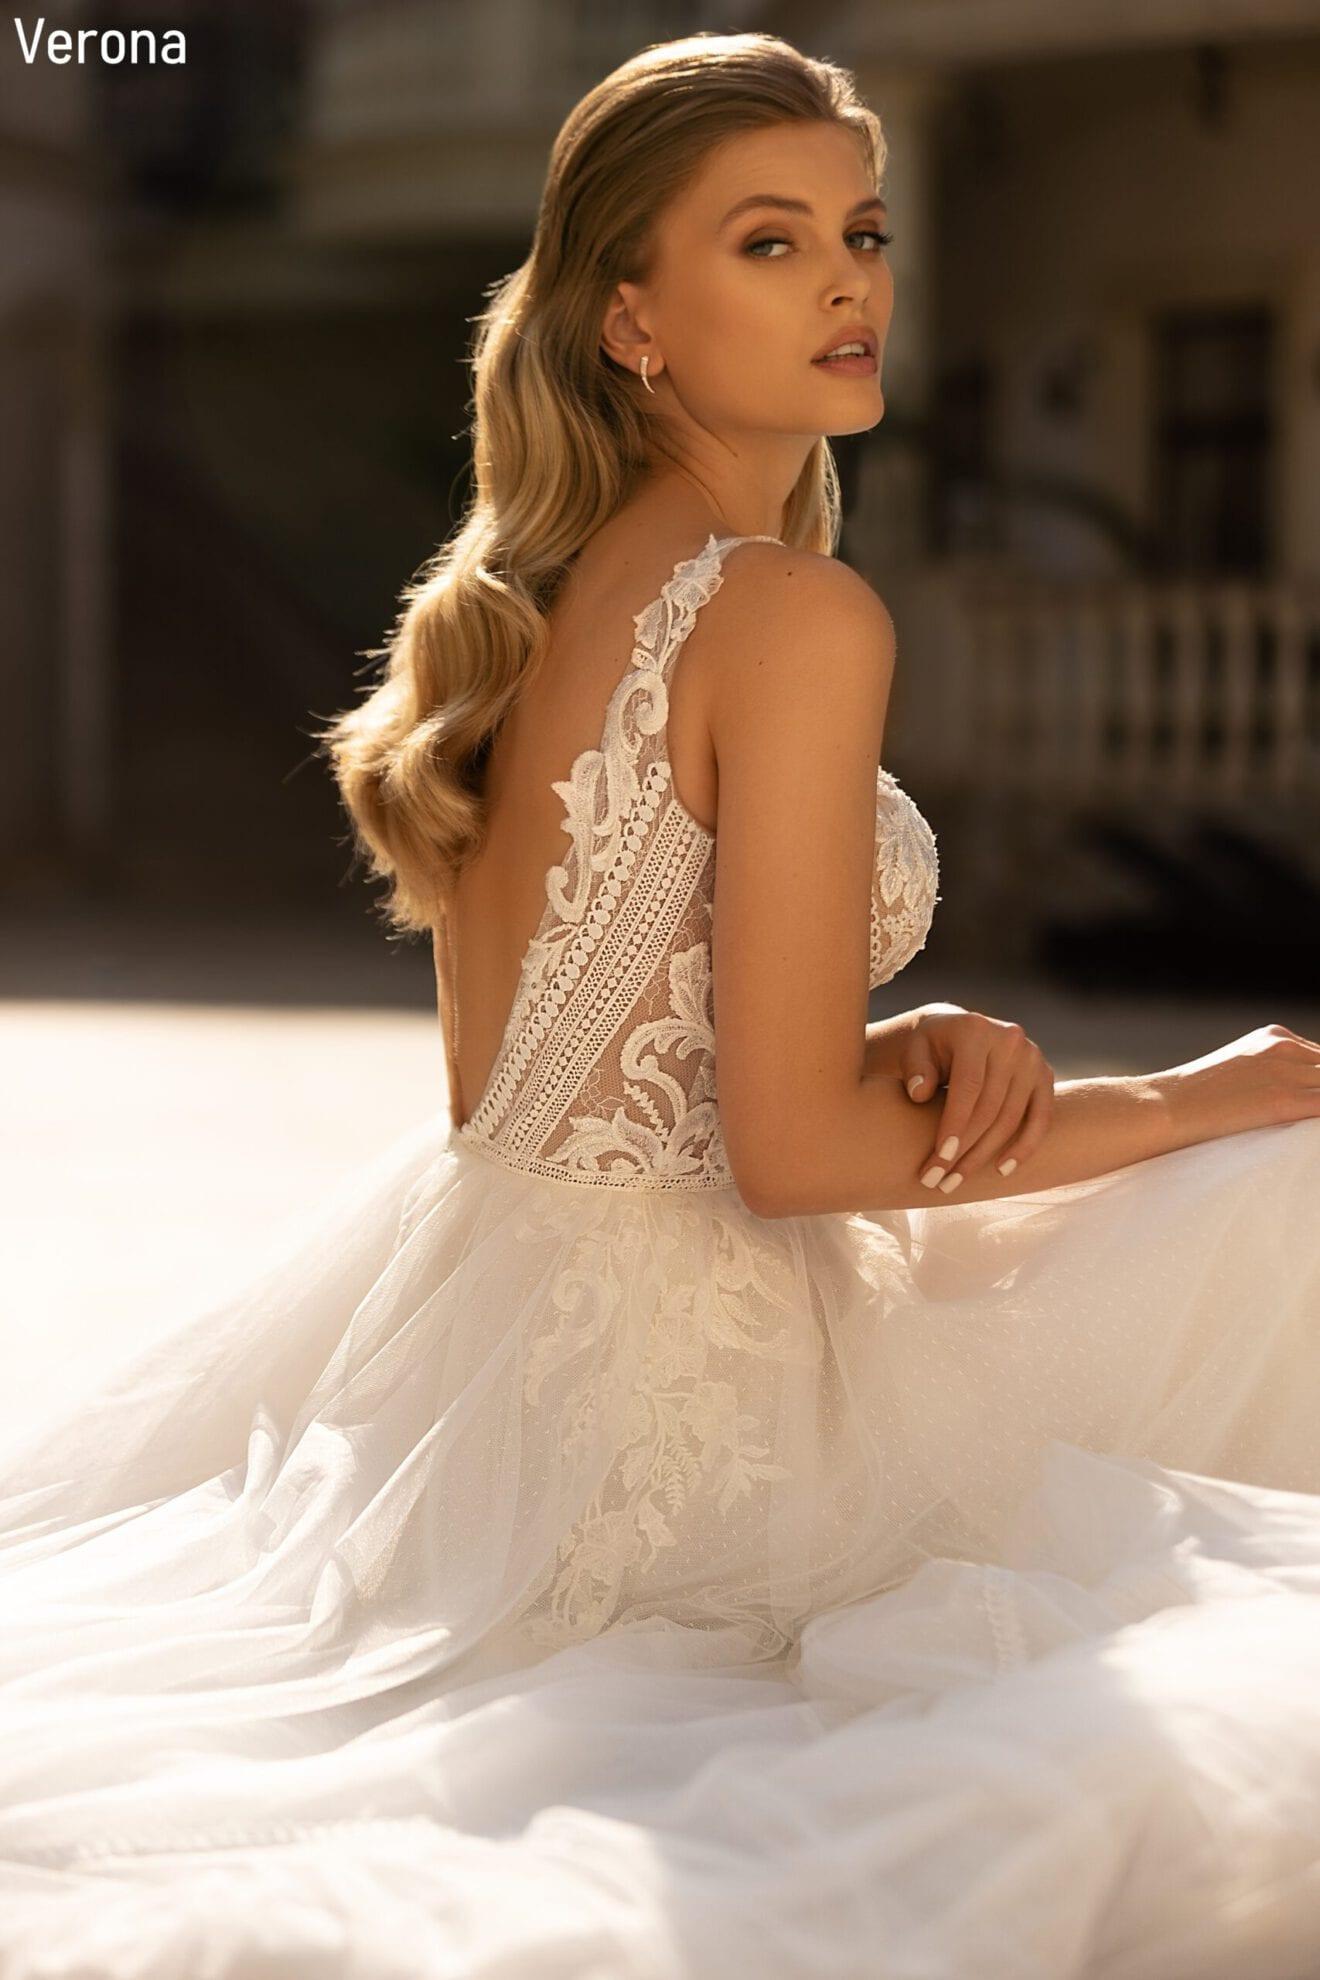 Boho Brautkleid  Bohemian Hochzeitskleid  Vintage Style